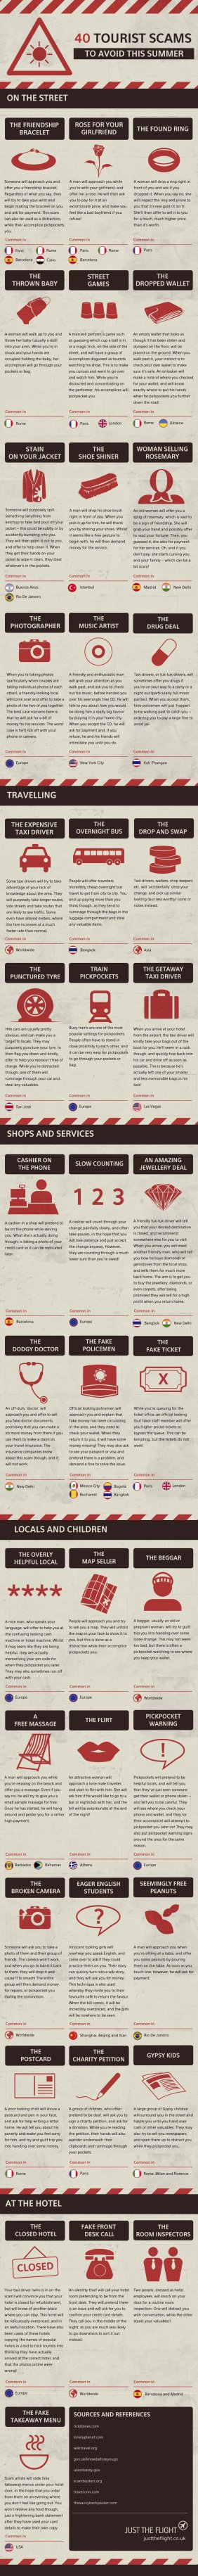 Tourist Infographic